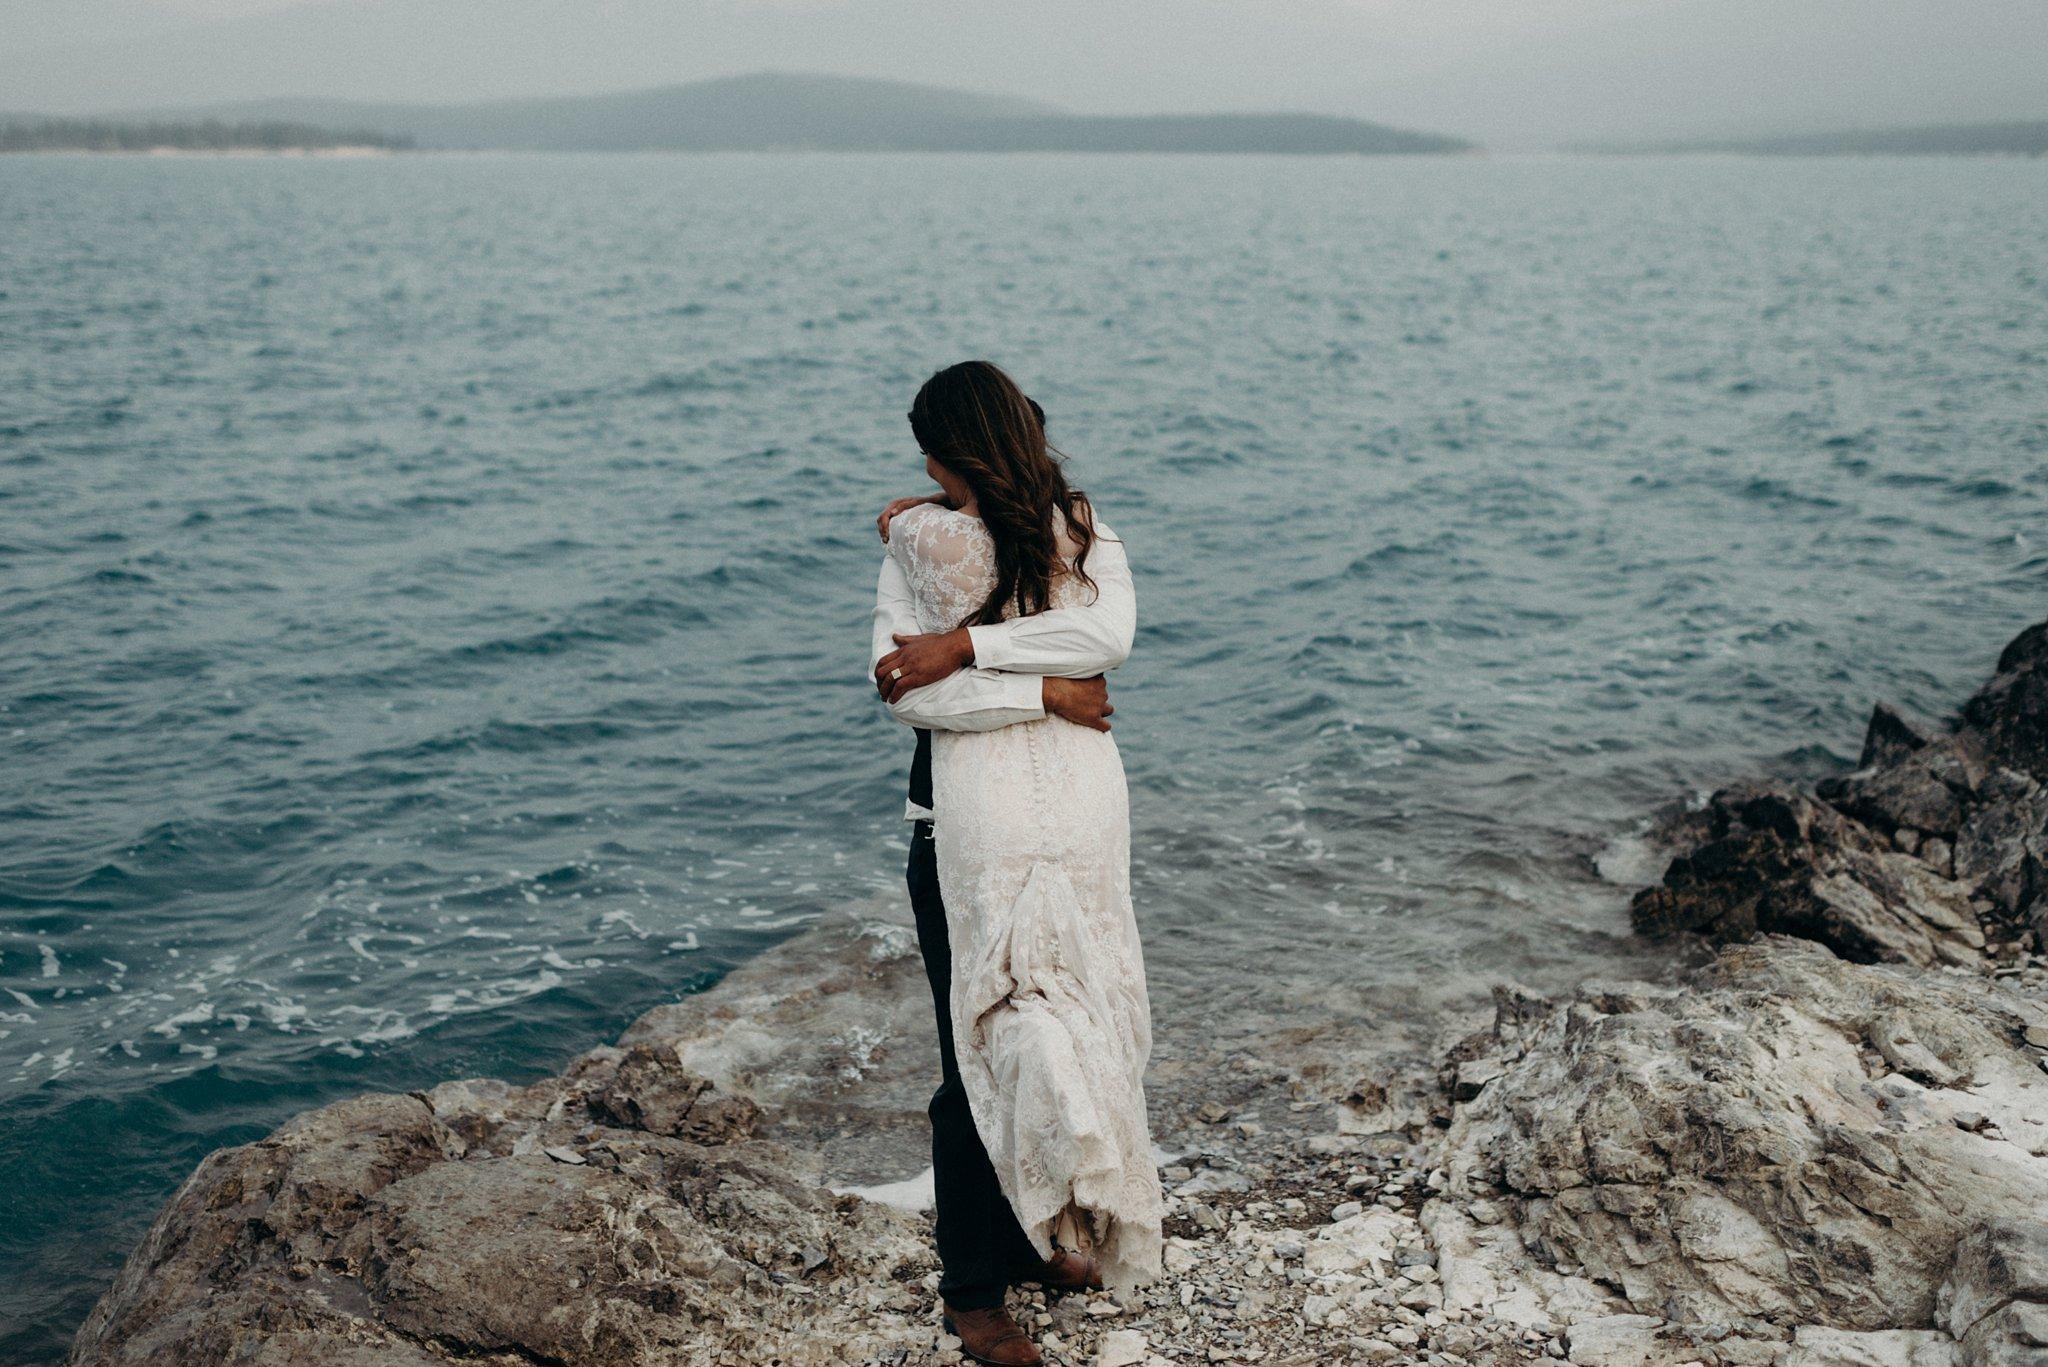 kaihla_tonai_intimate_wedding_elopement_photographer_6756.jpg